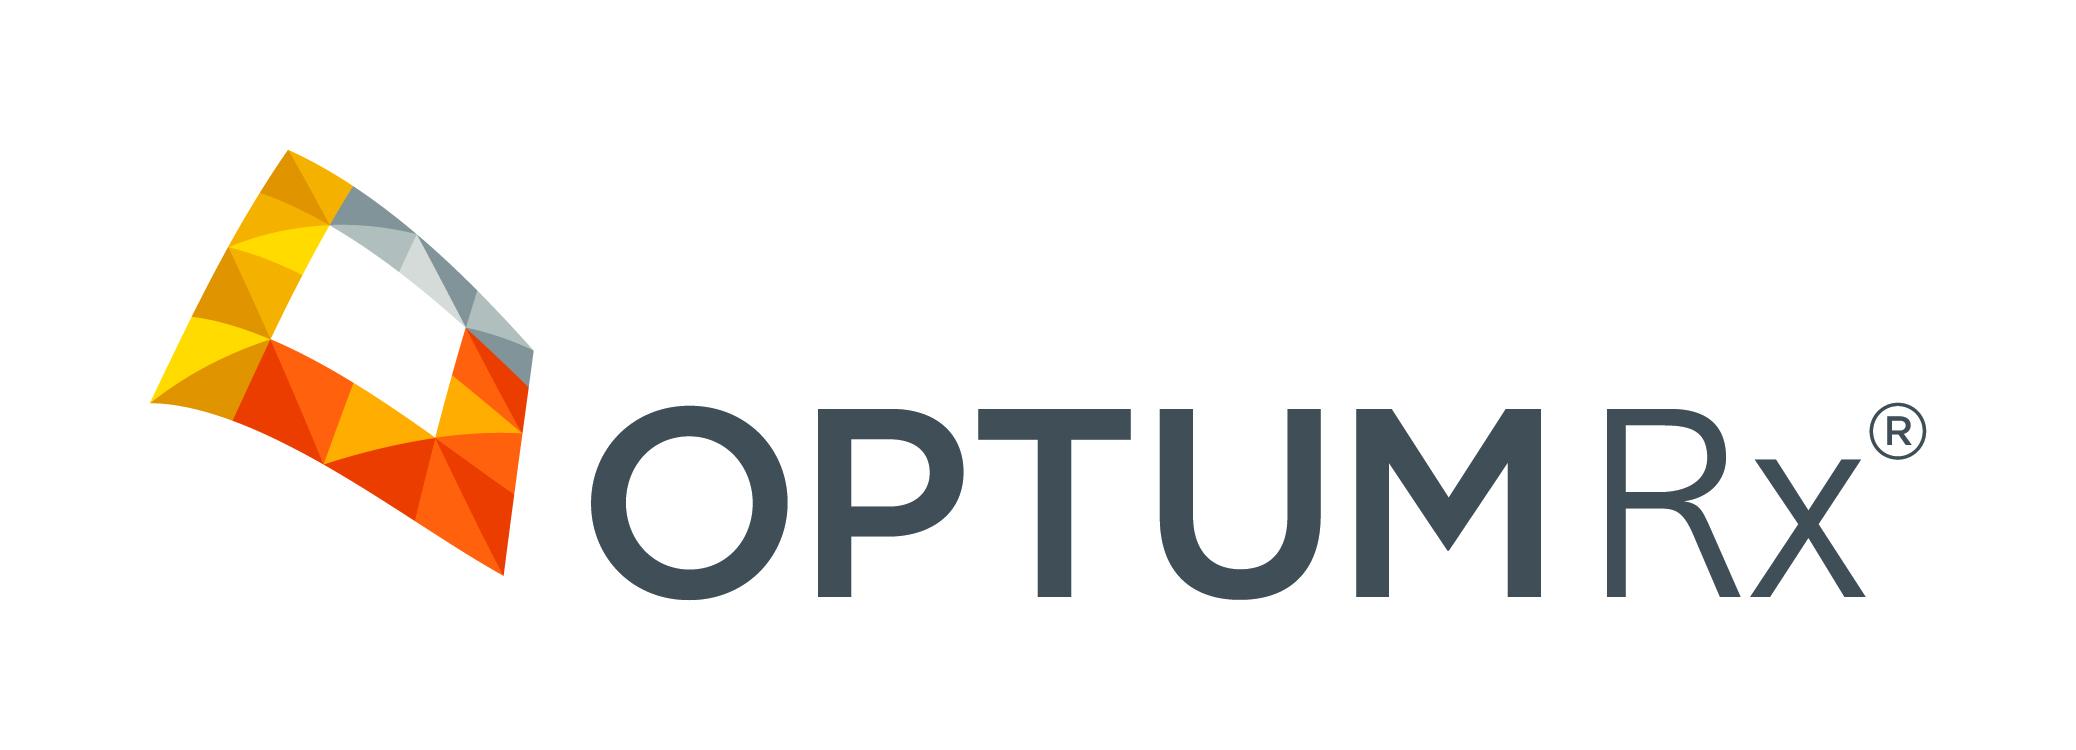 OptumRx(R)_4C